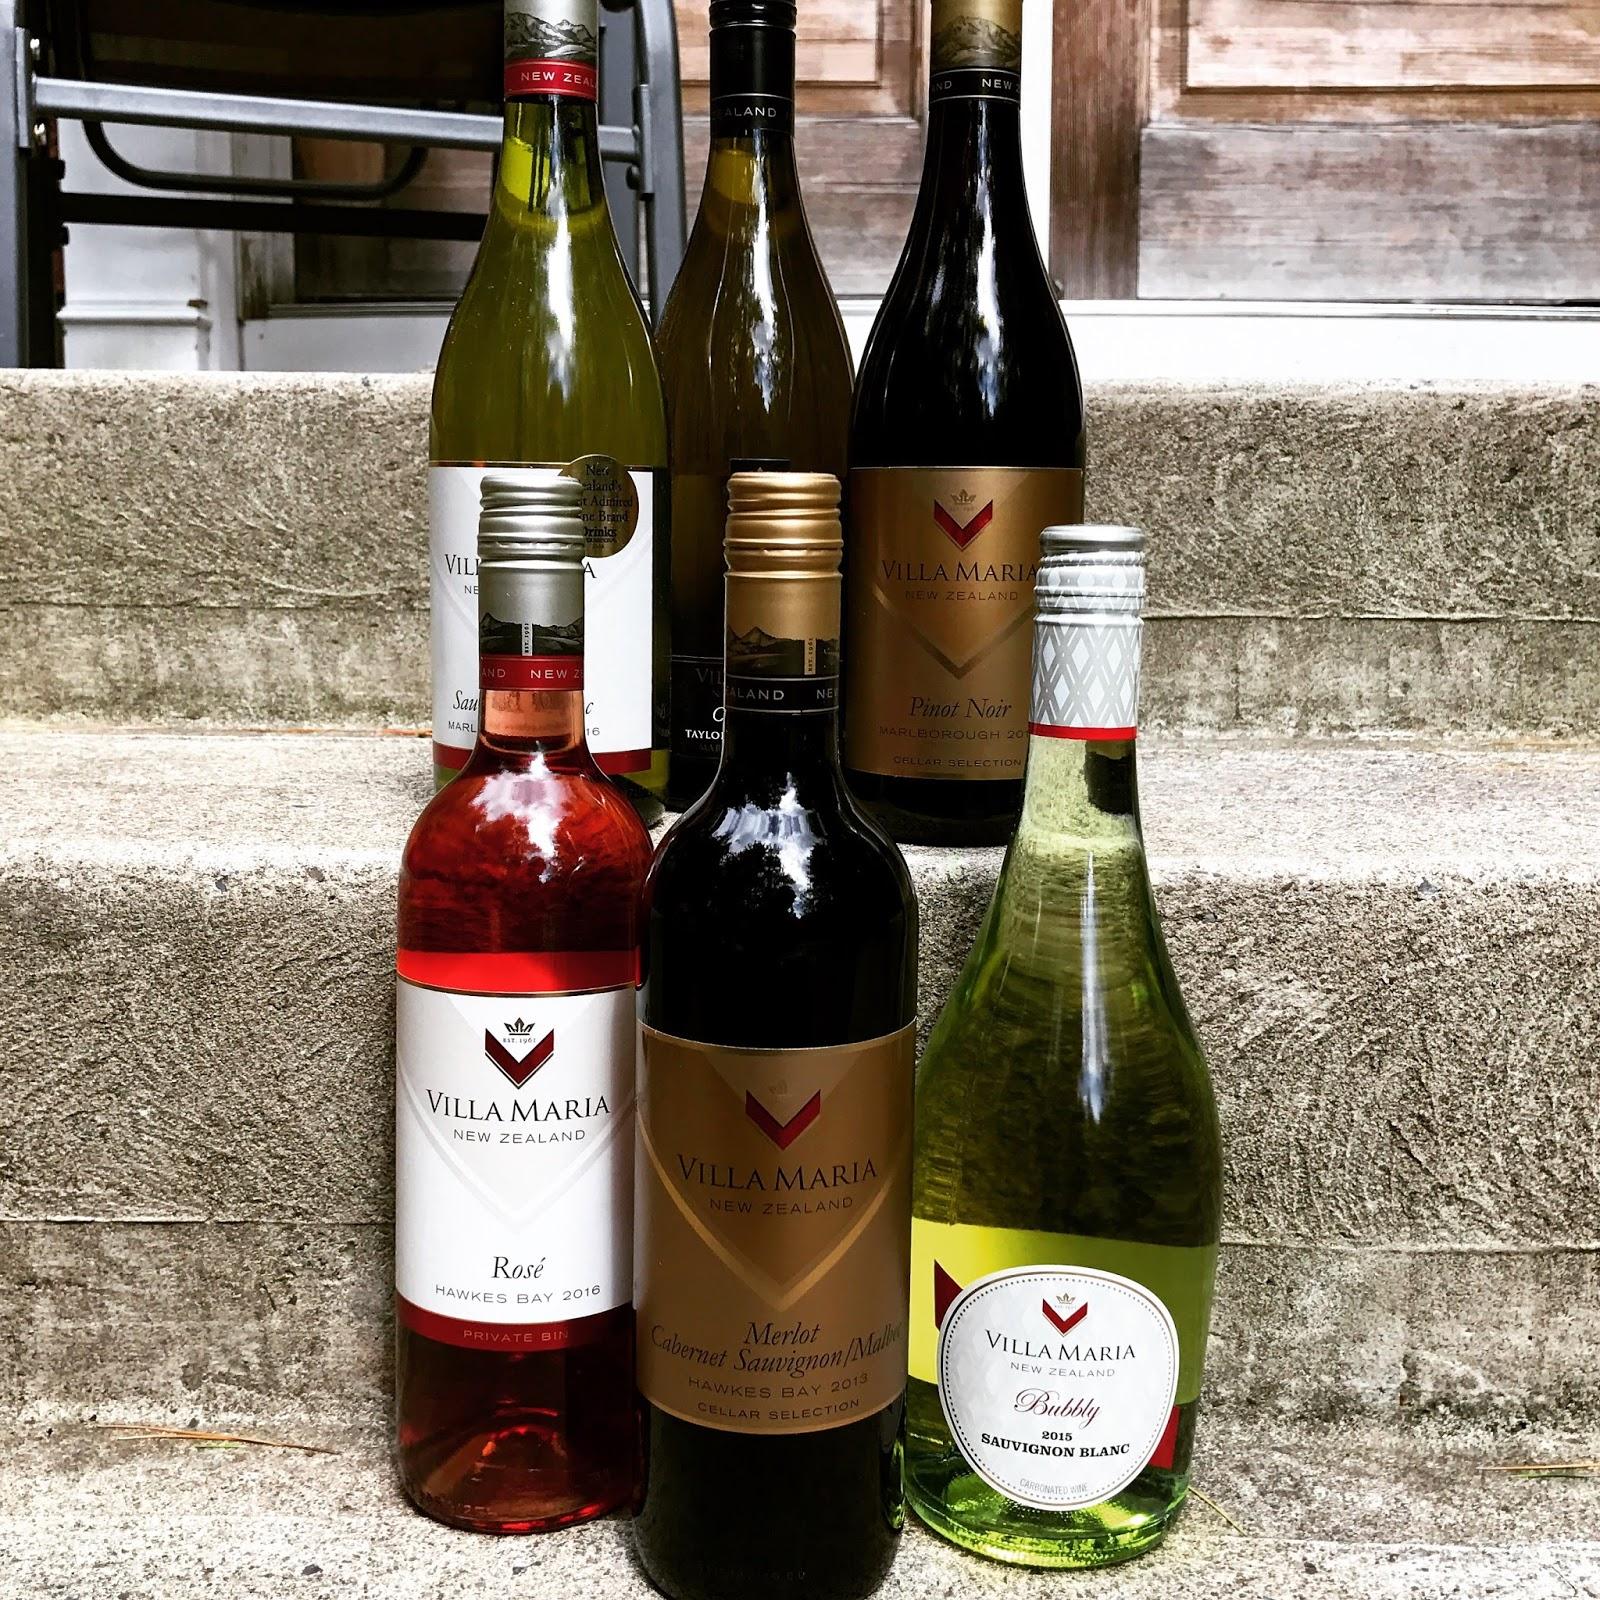 Snooth Virtual Tasting - Villa Maria | The Nittany Epicurean